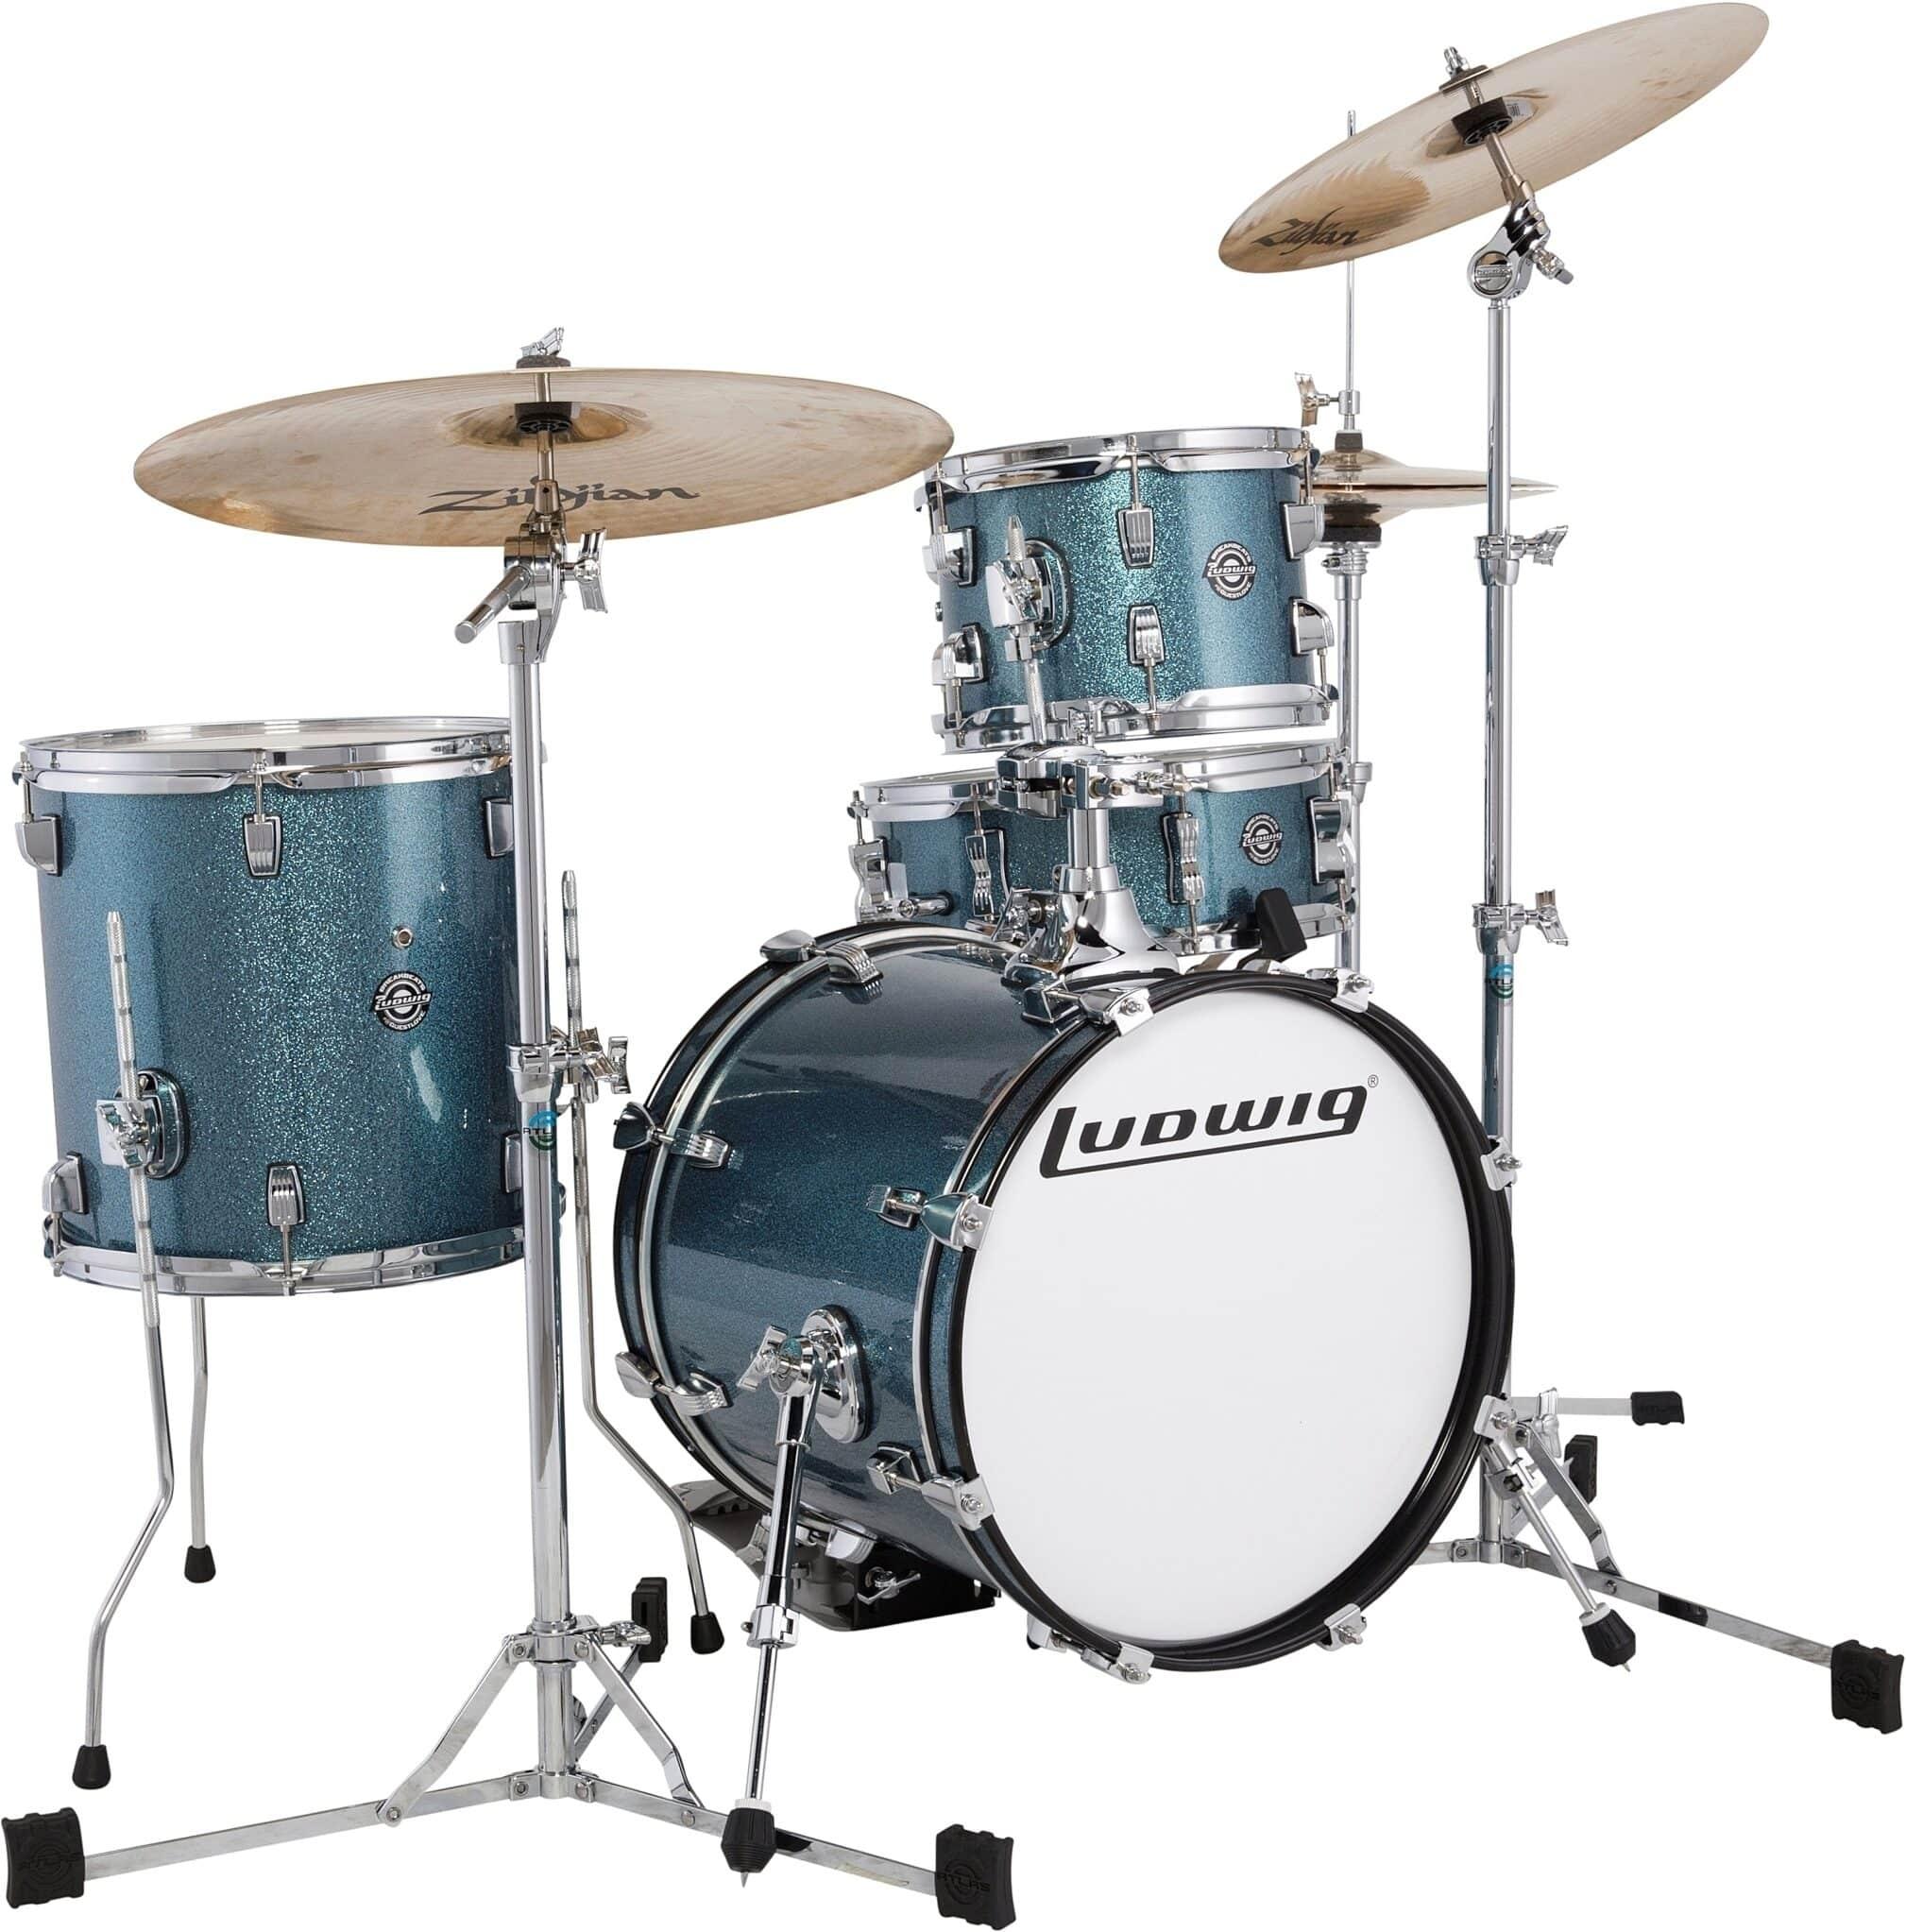 Drum-Ludwig-Breakbeats